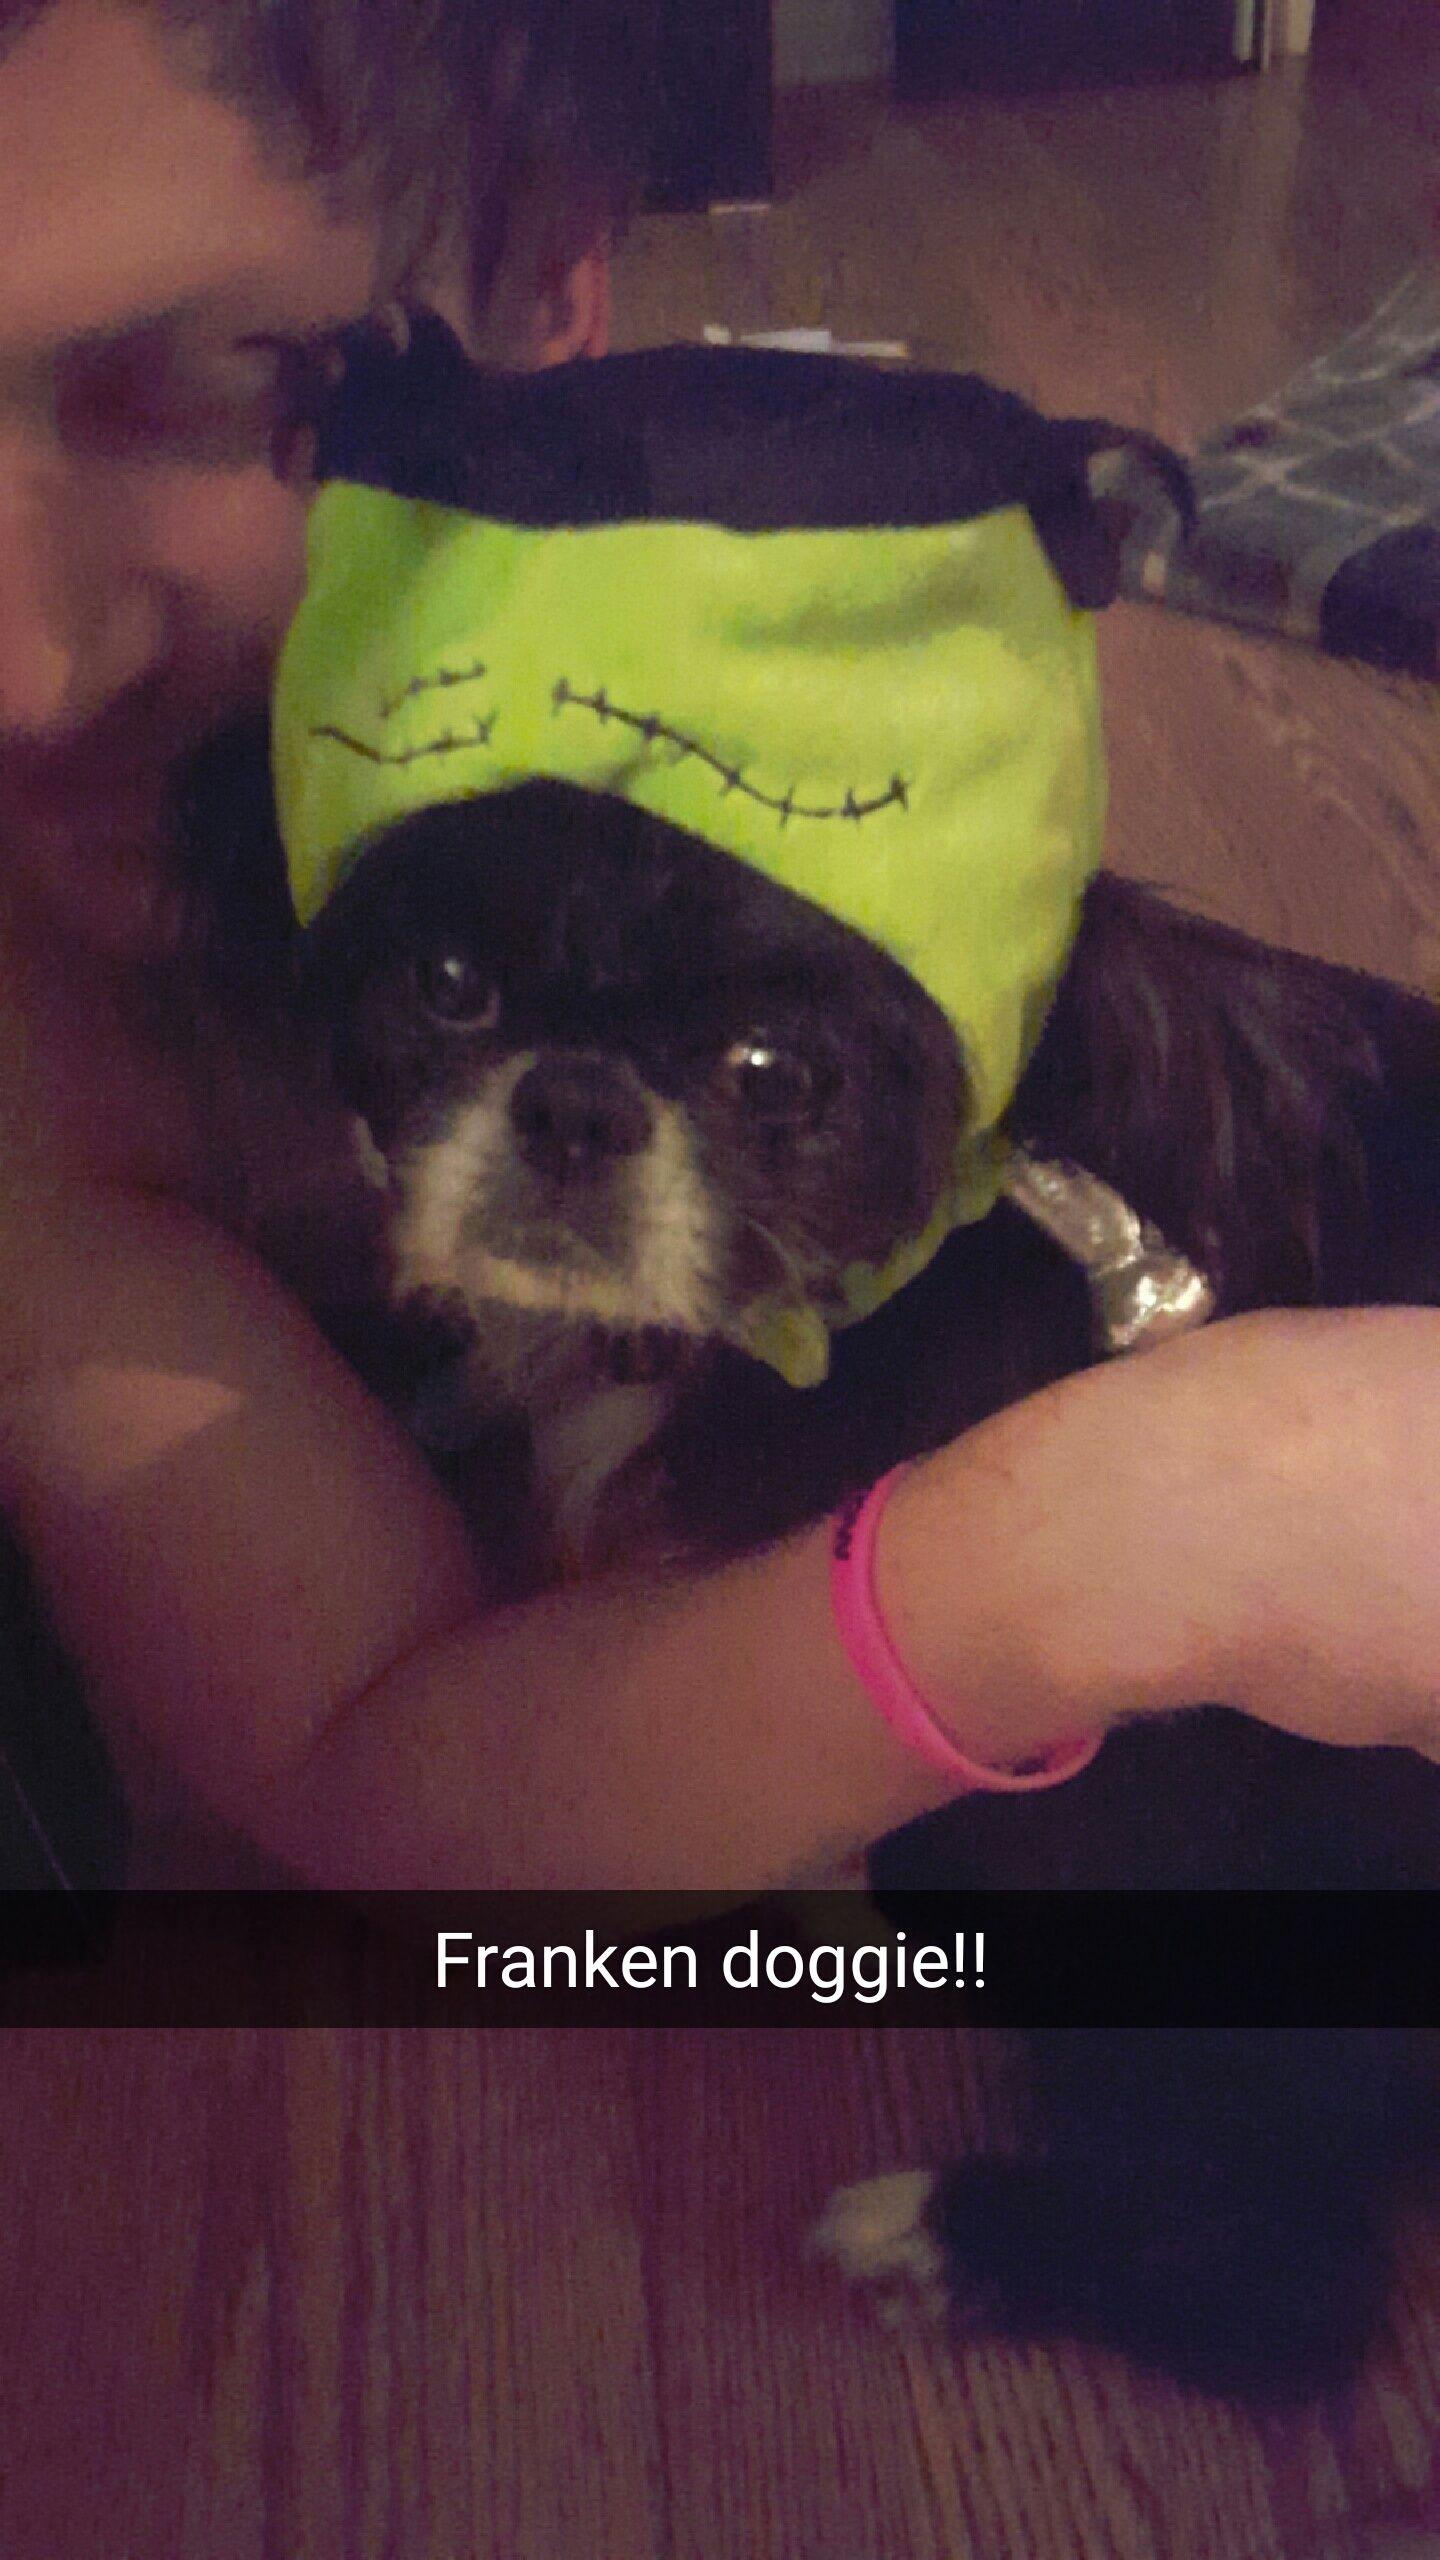 Frankendoggie! http://ift.tt/2epN5mY